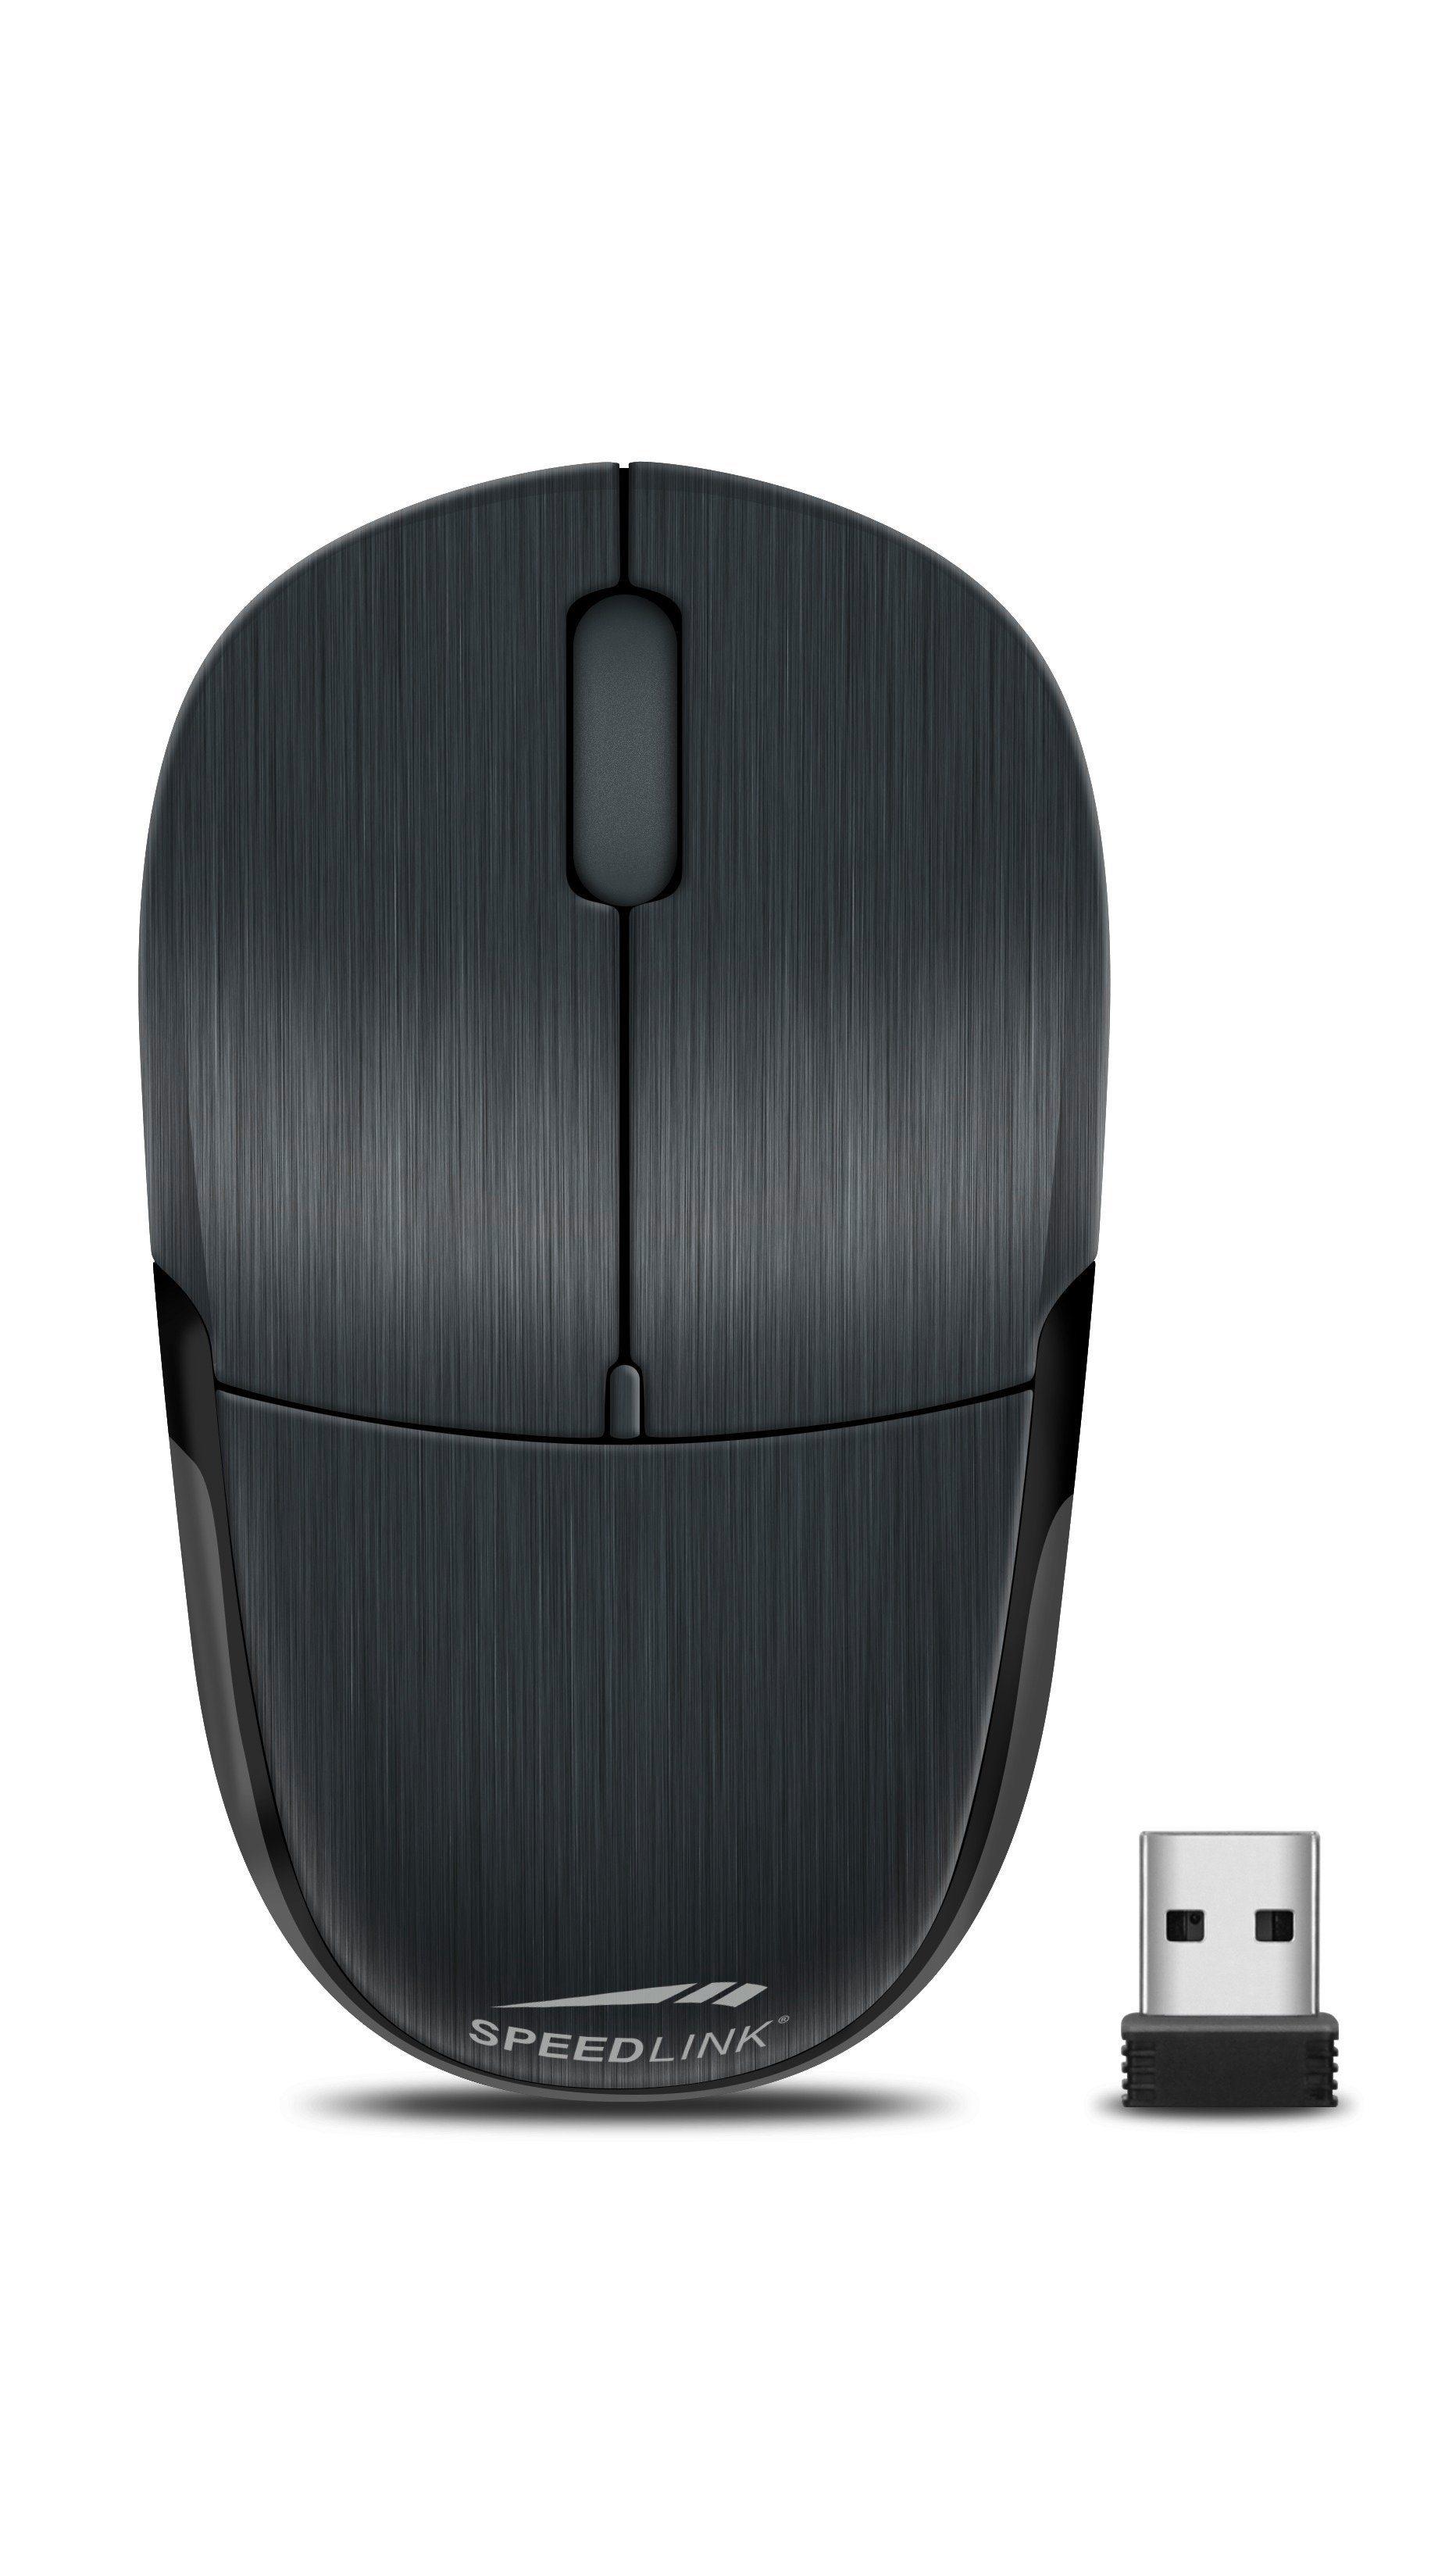 SPEEDLINK kabellose Maus »JIXSTER Mouse - Wireless«